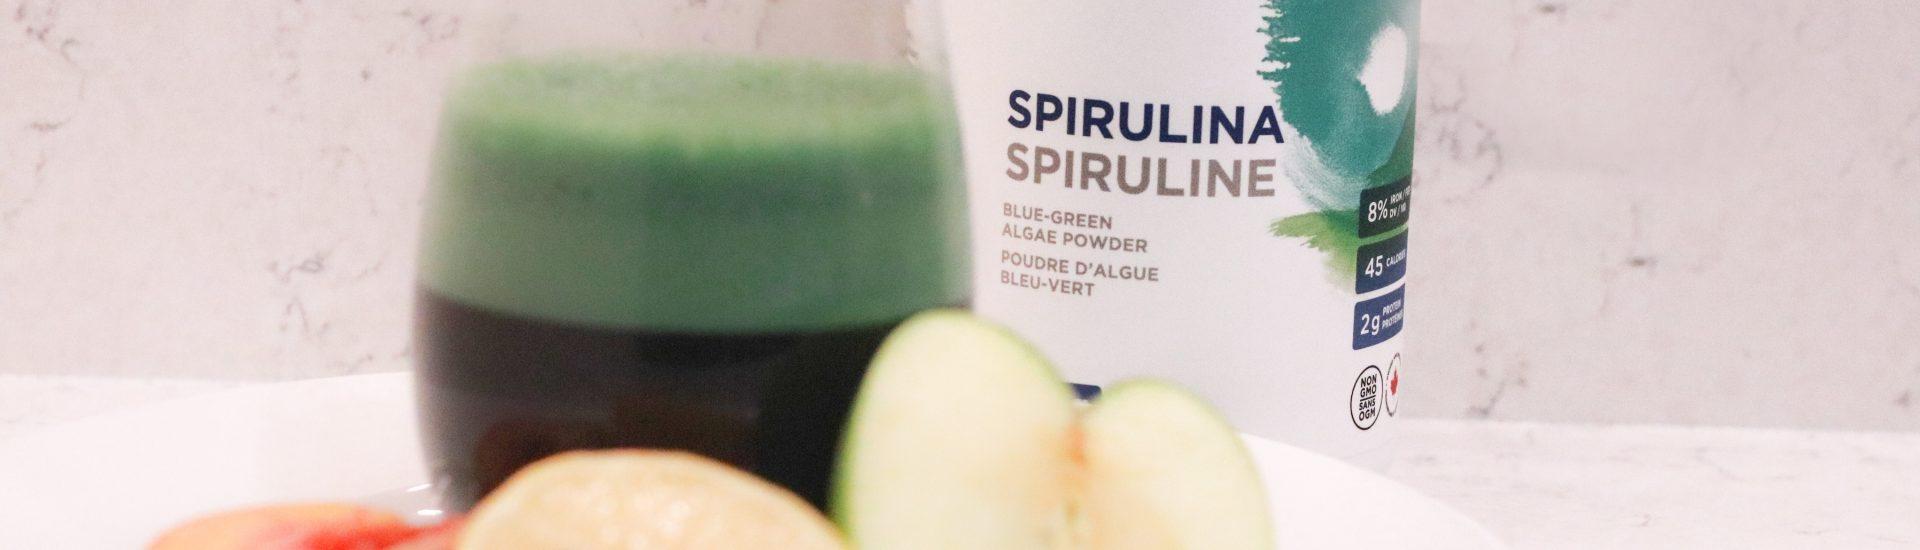 spirulina green smoothie recipe.